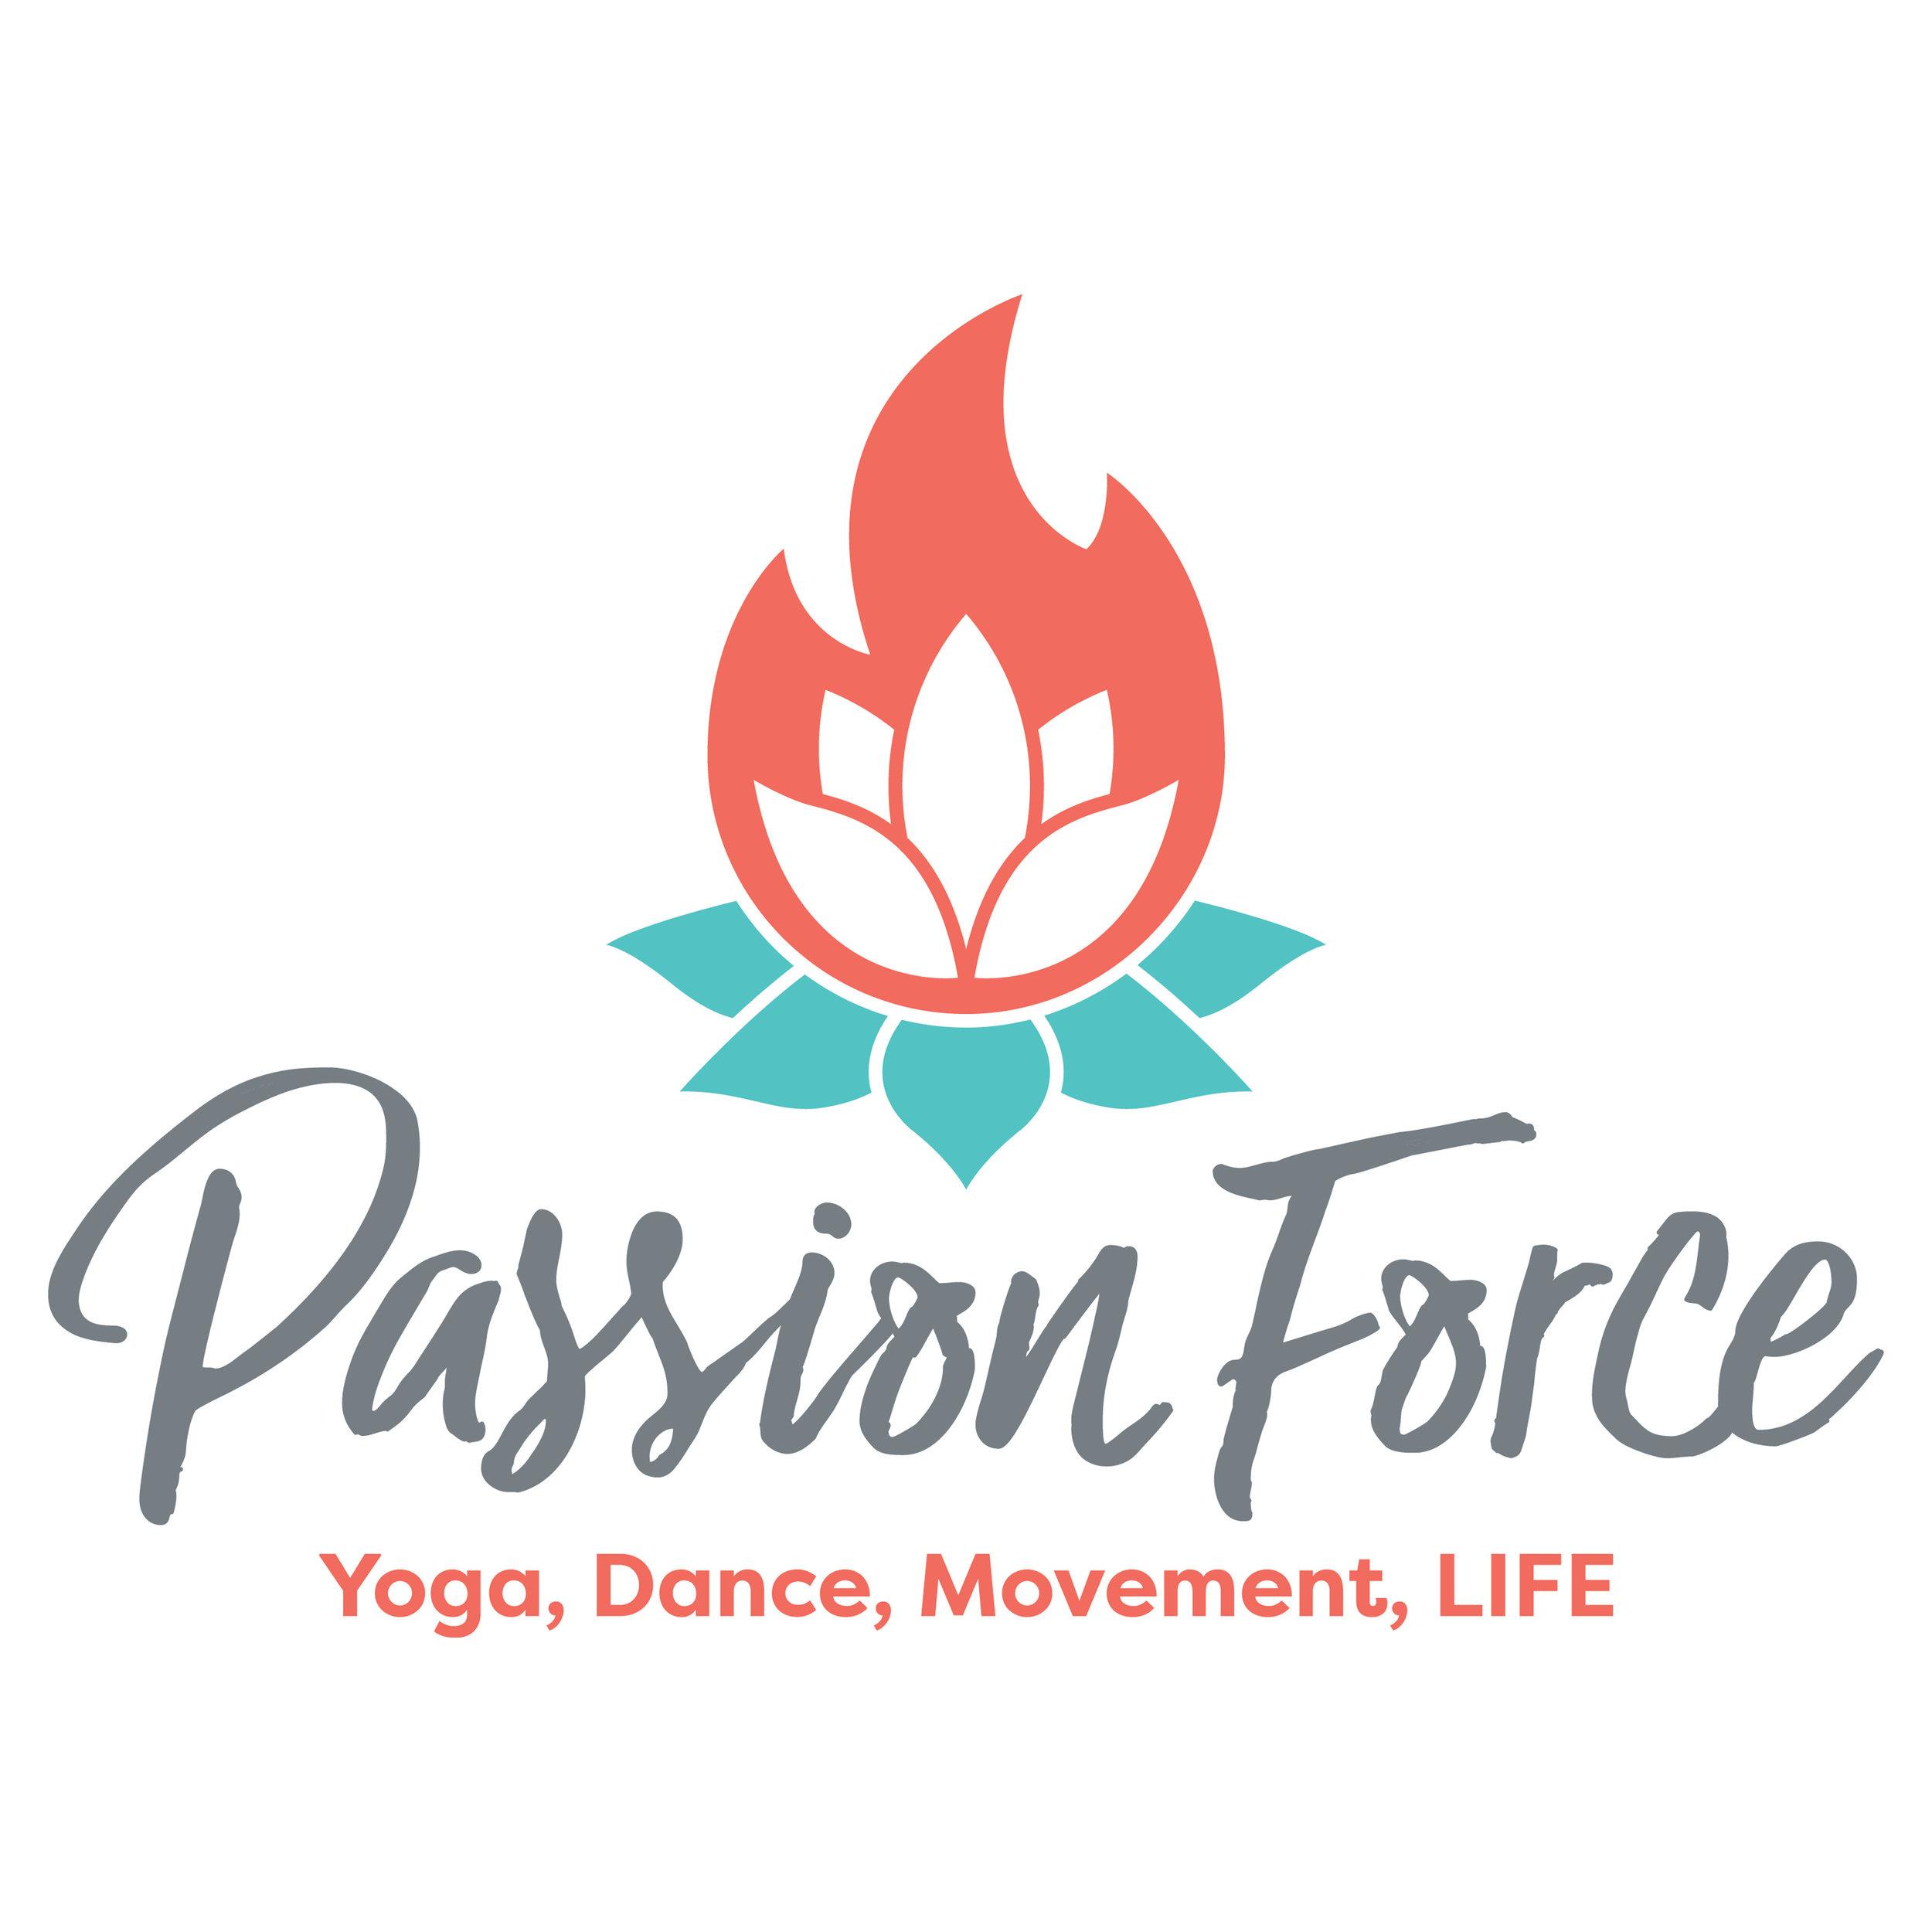 18-Passion-Force-Logo.jpg